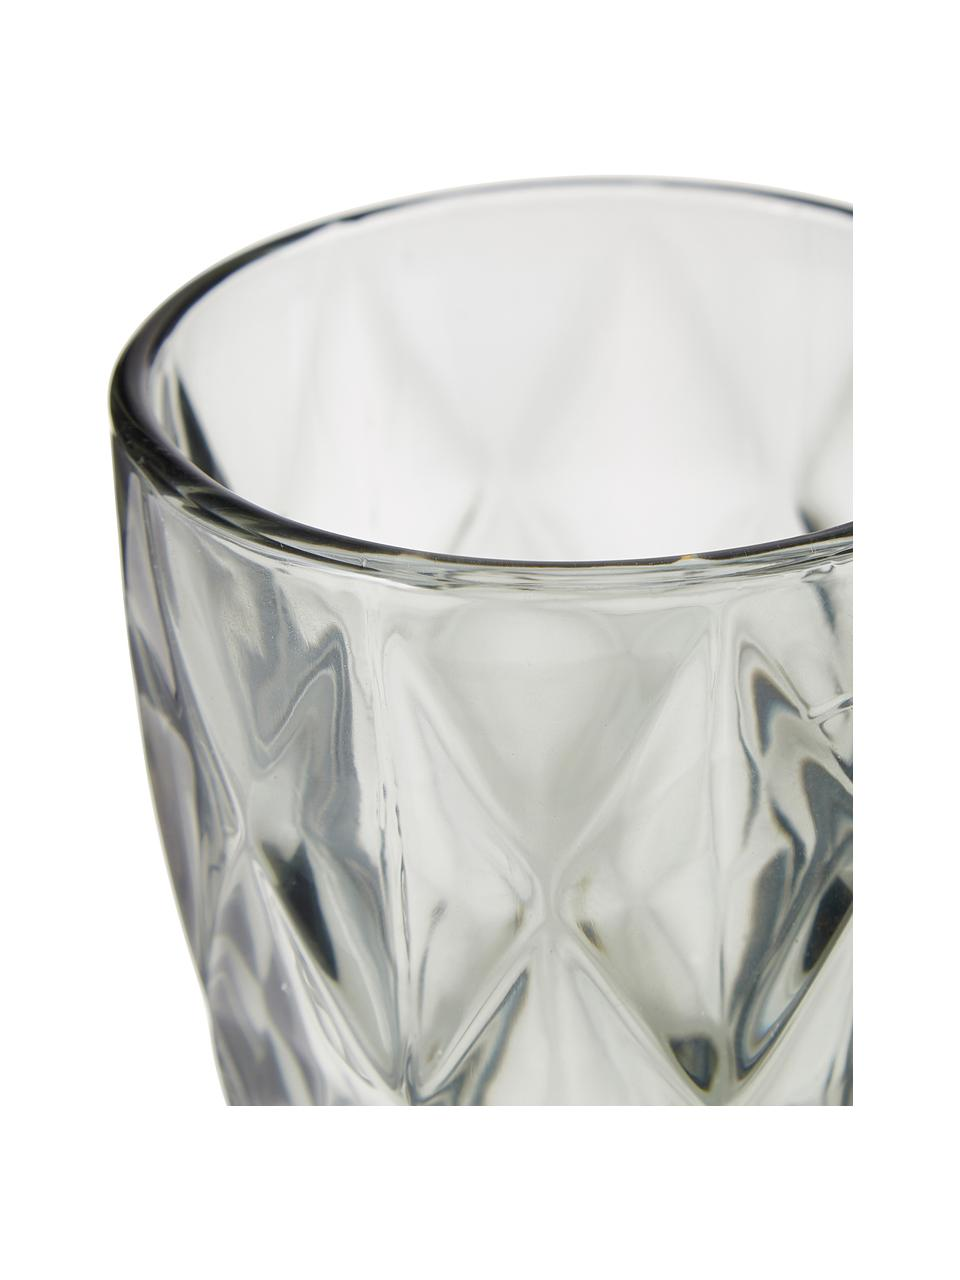 Szklanka Colorado, 4 szt., Szkło, Szary, transparentny, Ø 8 x W 10 cm